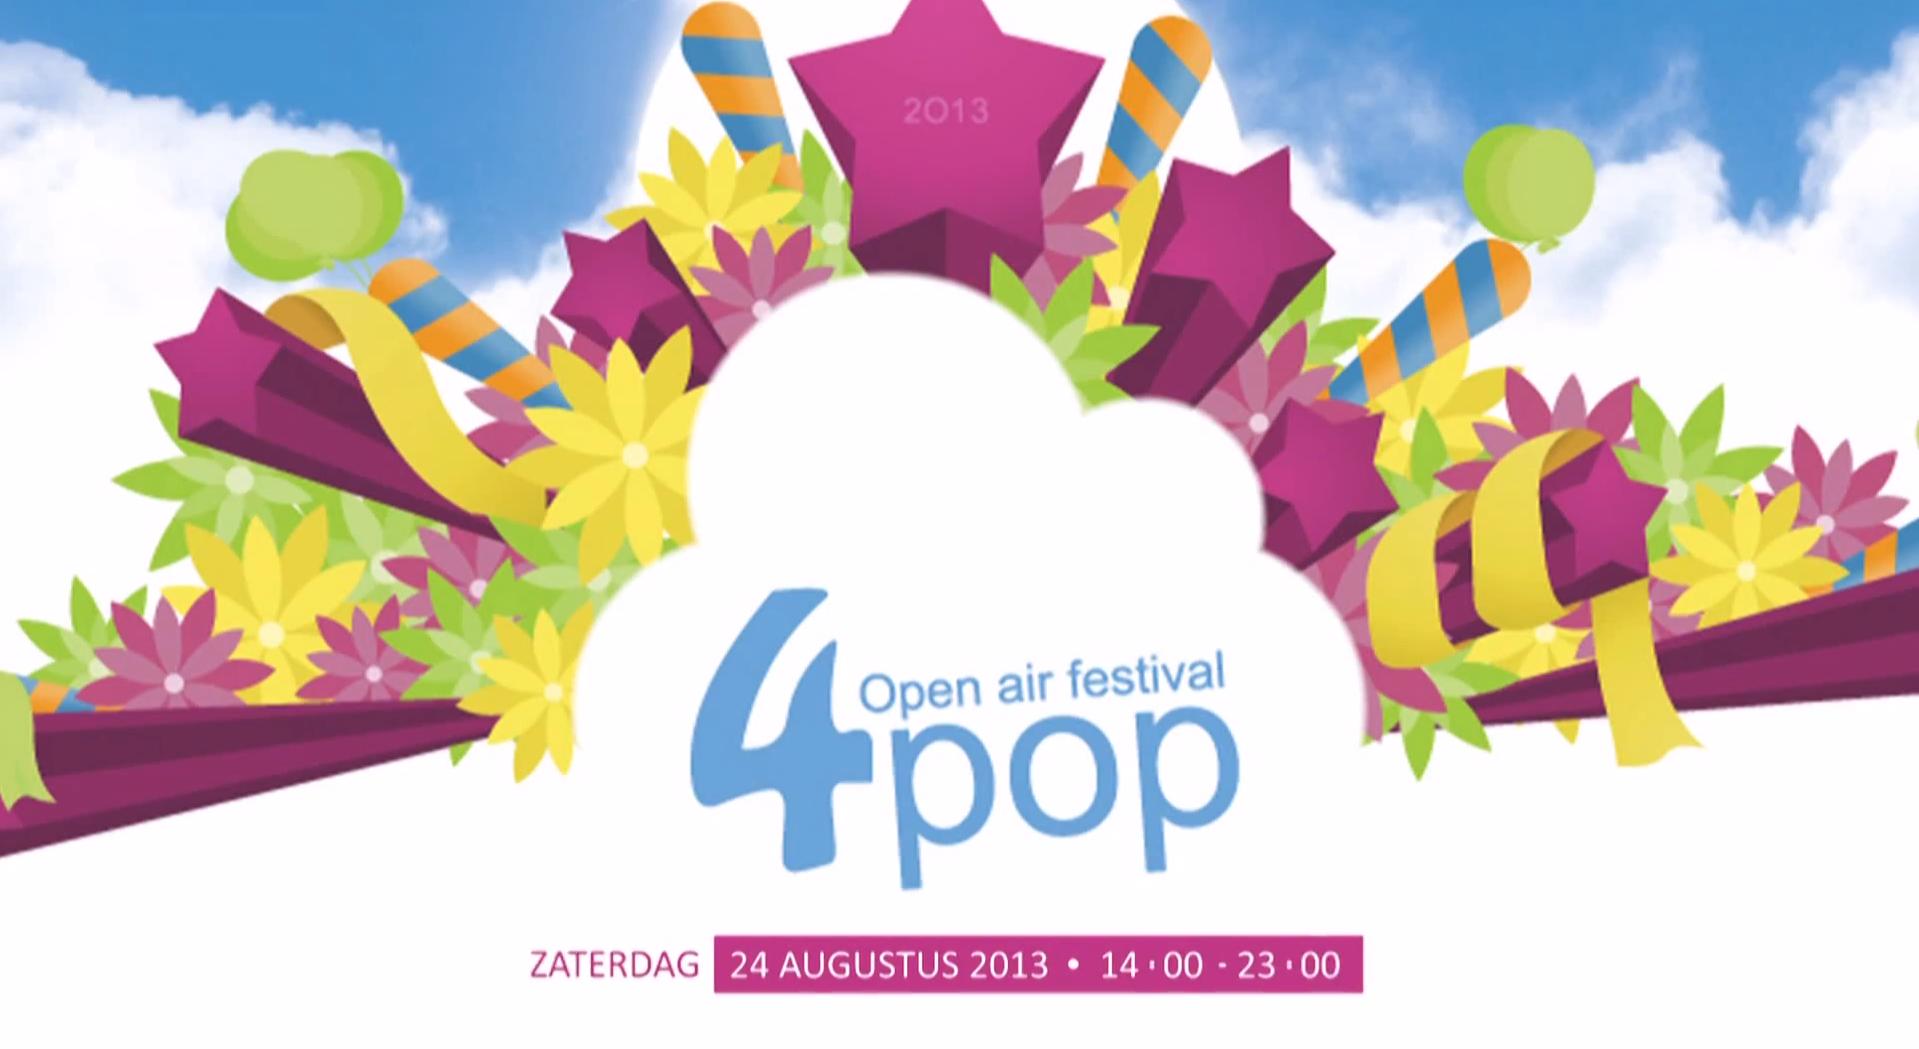 4pop Festival 2013